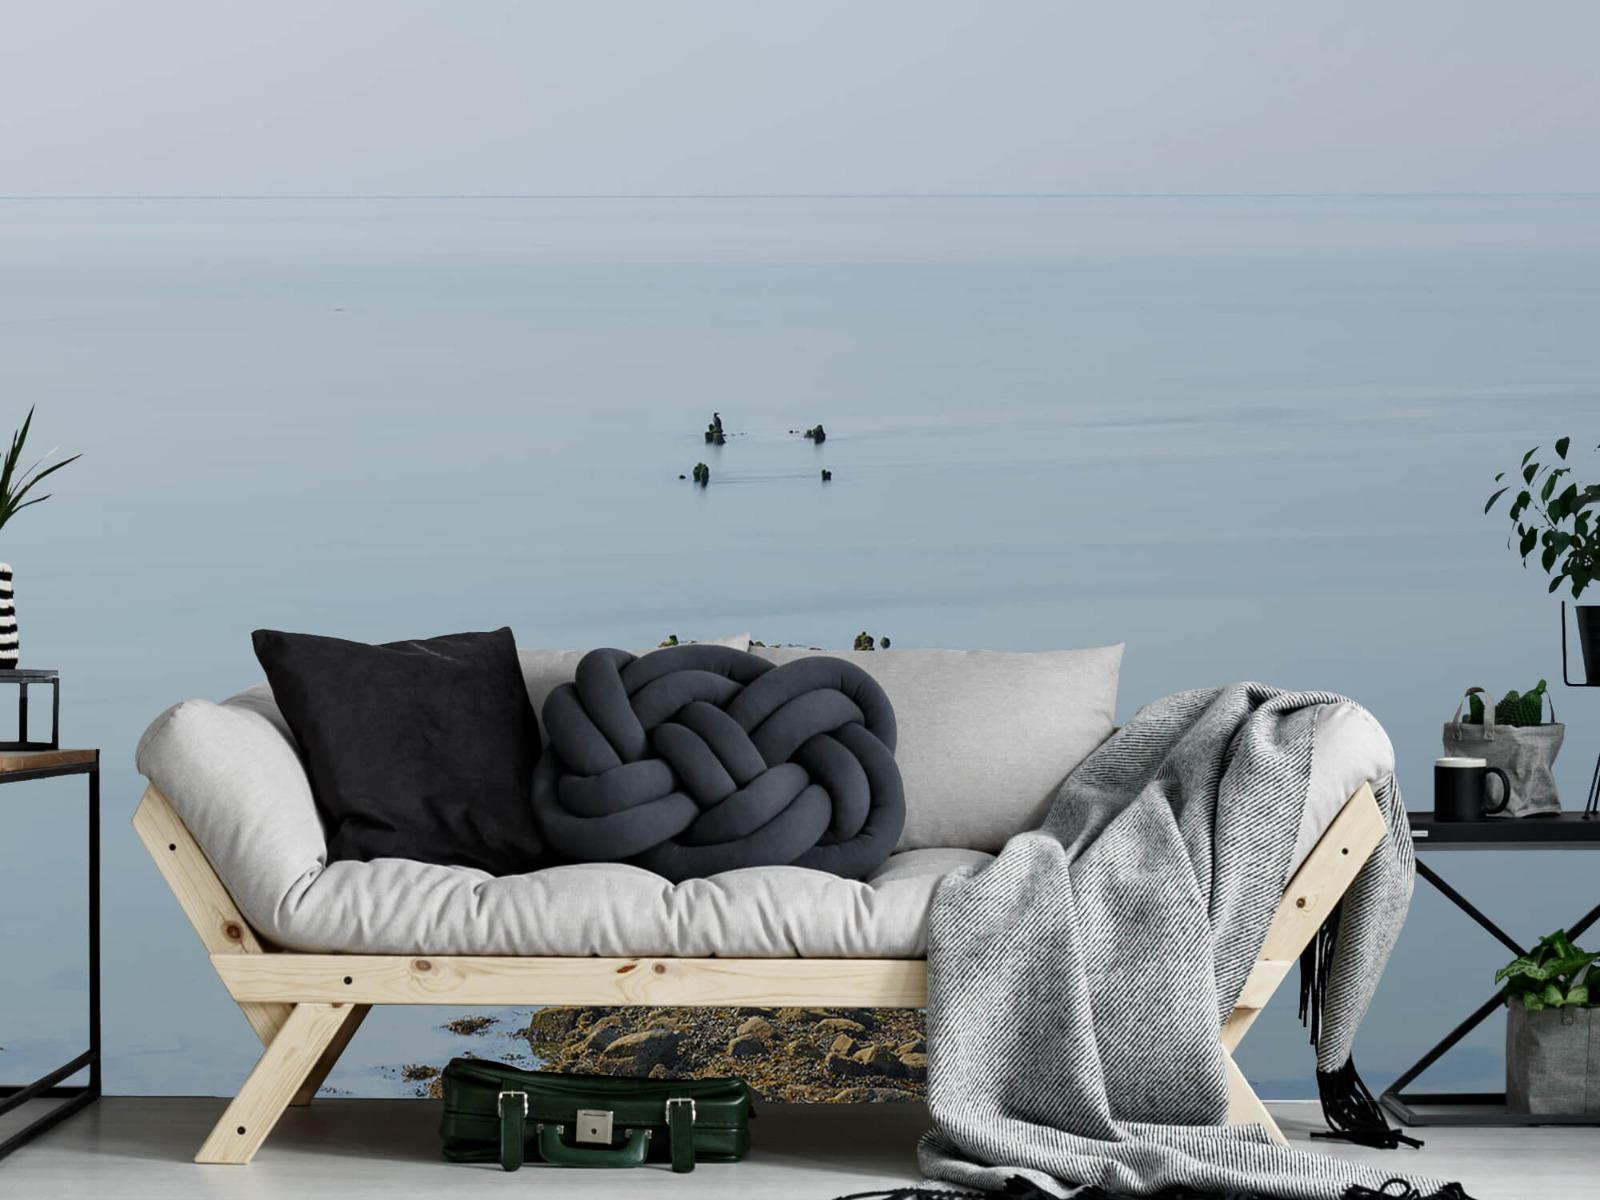 Zeeën en Oceanen - Golfbreker - Slaapkamer 6